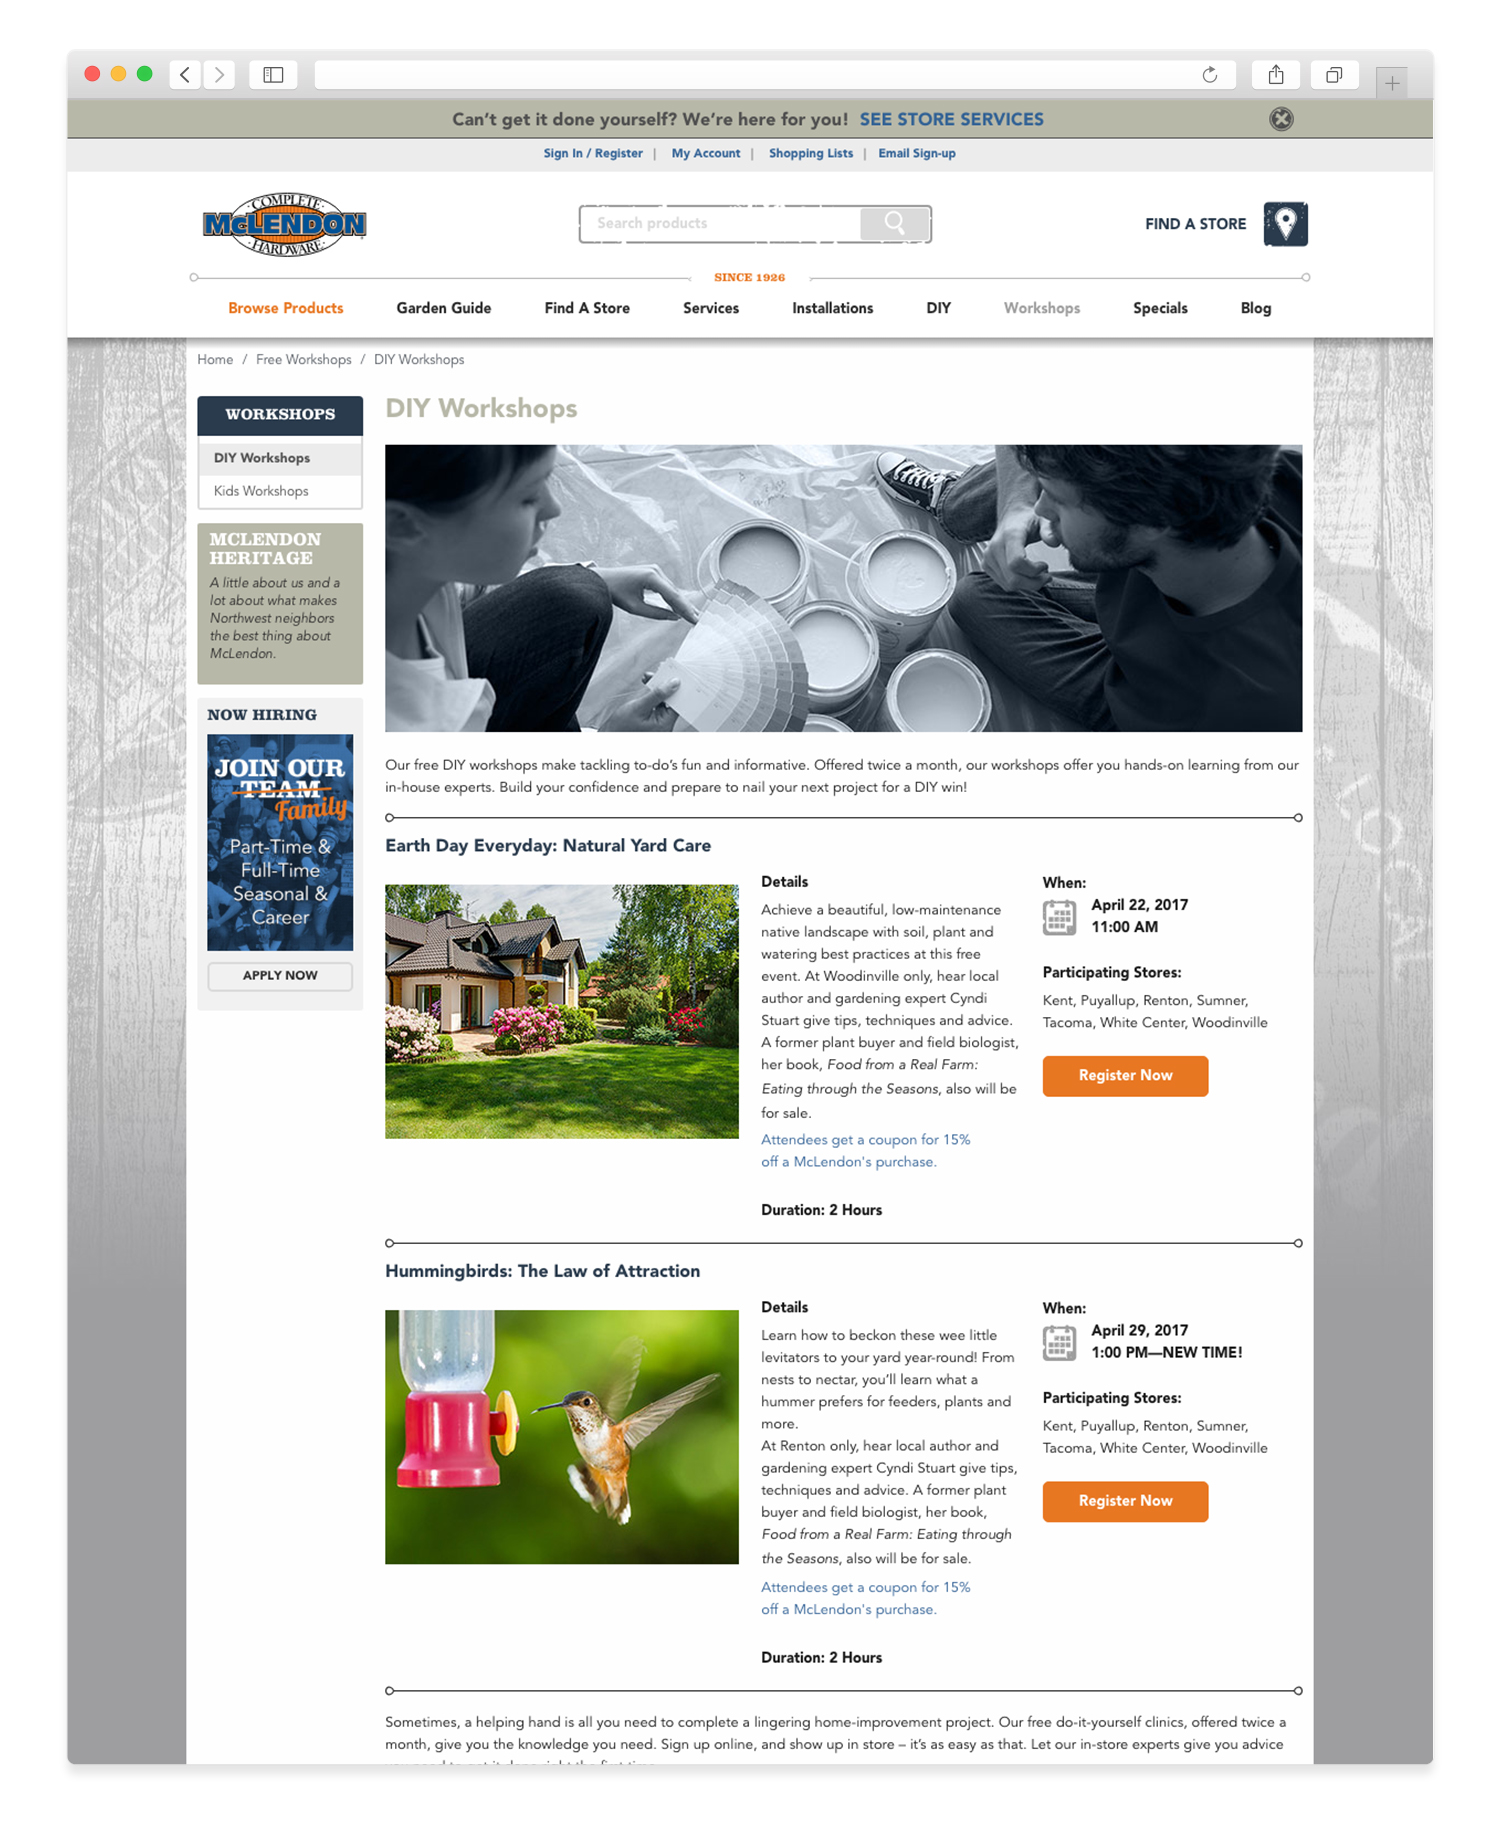 mclendon-website-workshops.jpg